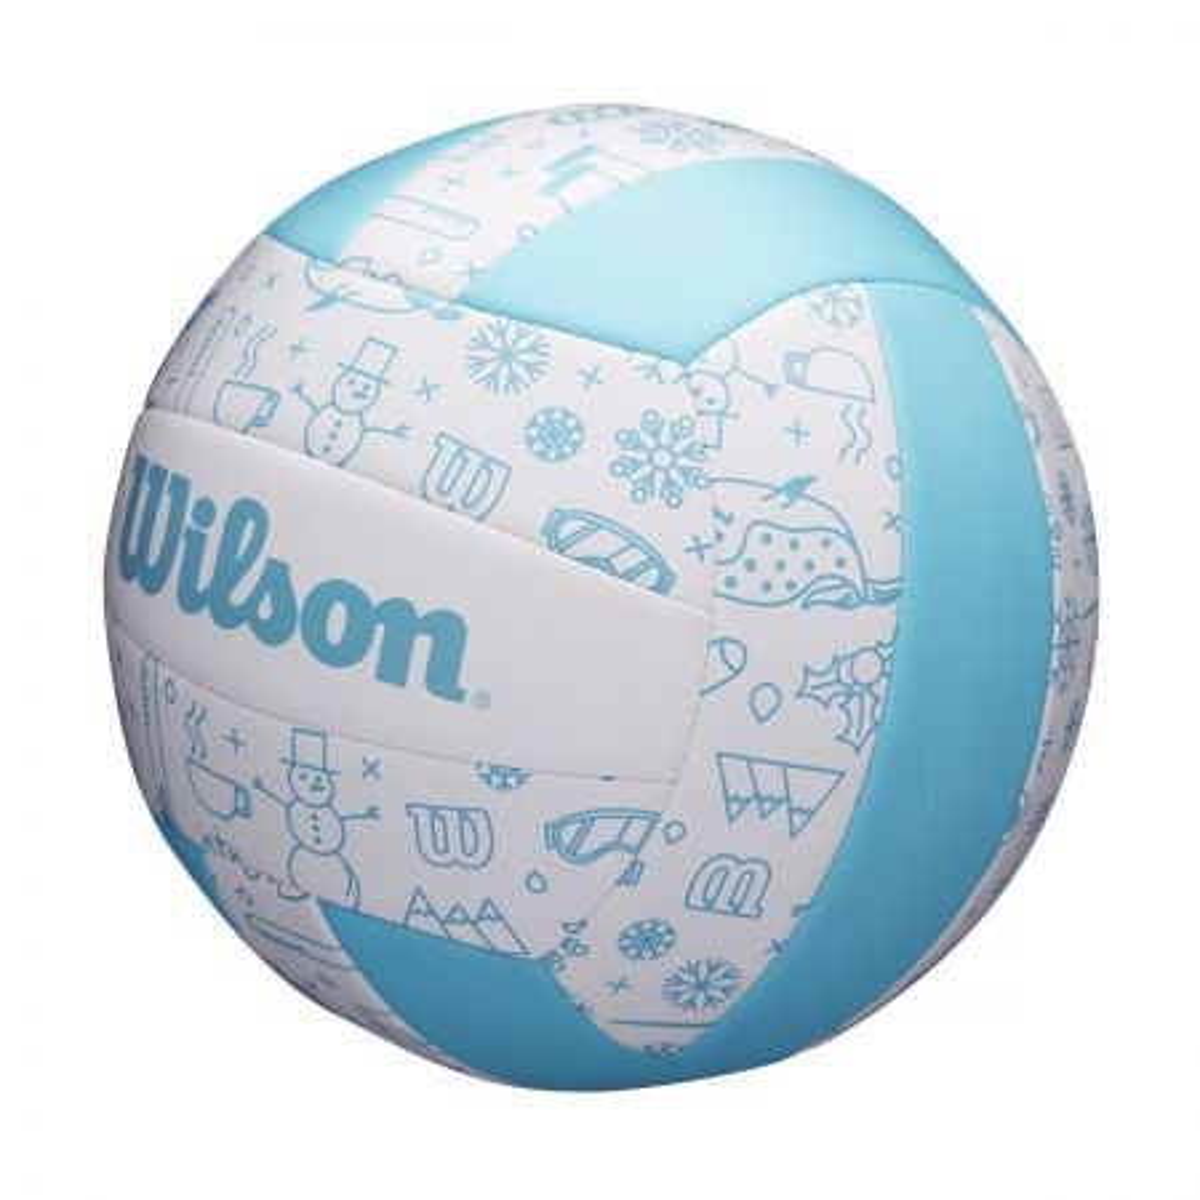 Wilson Seasonal lopta za odbojku